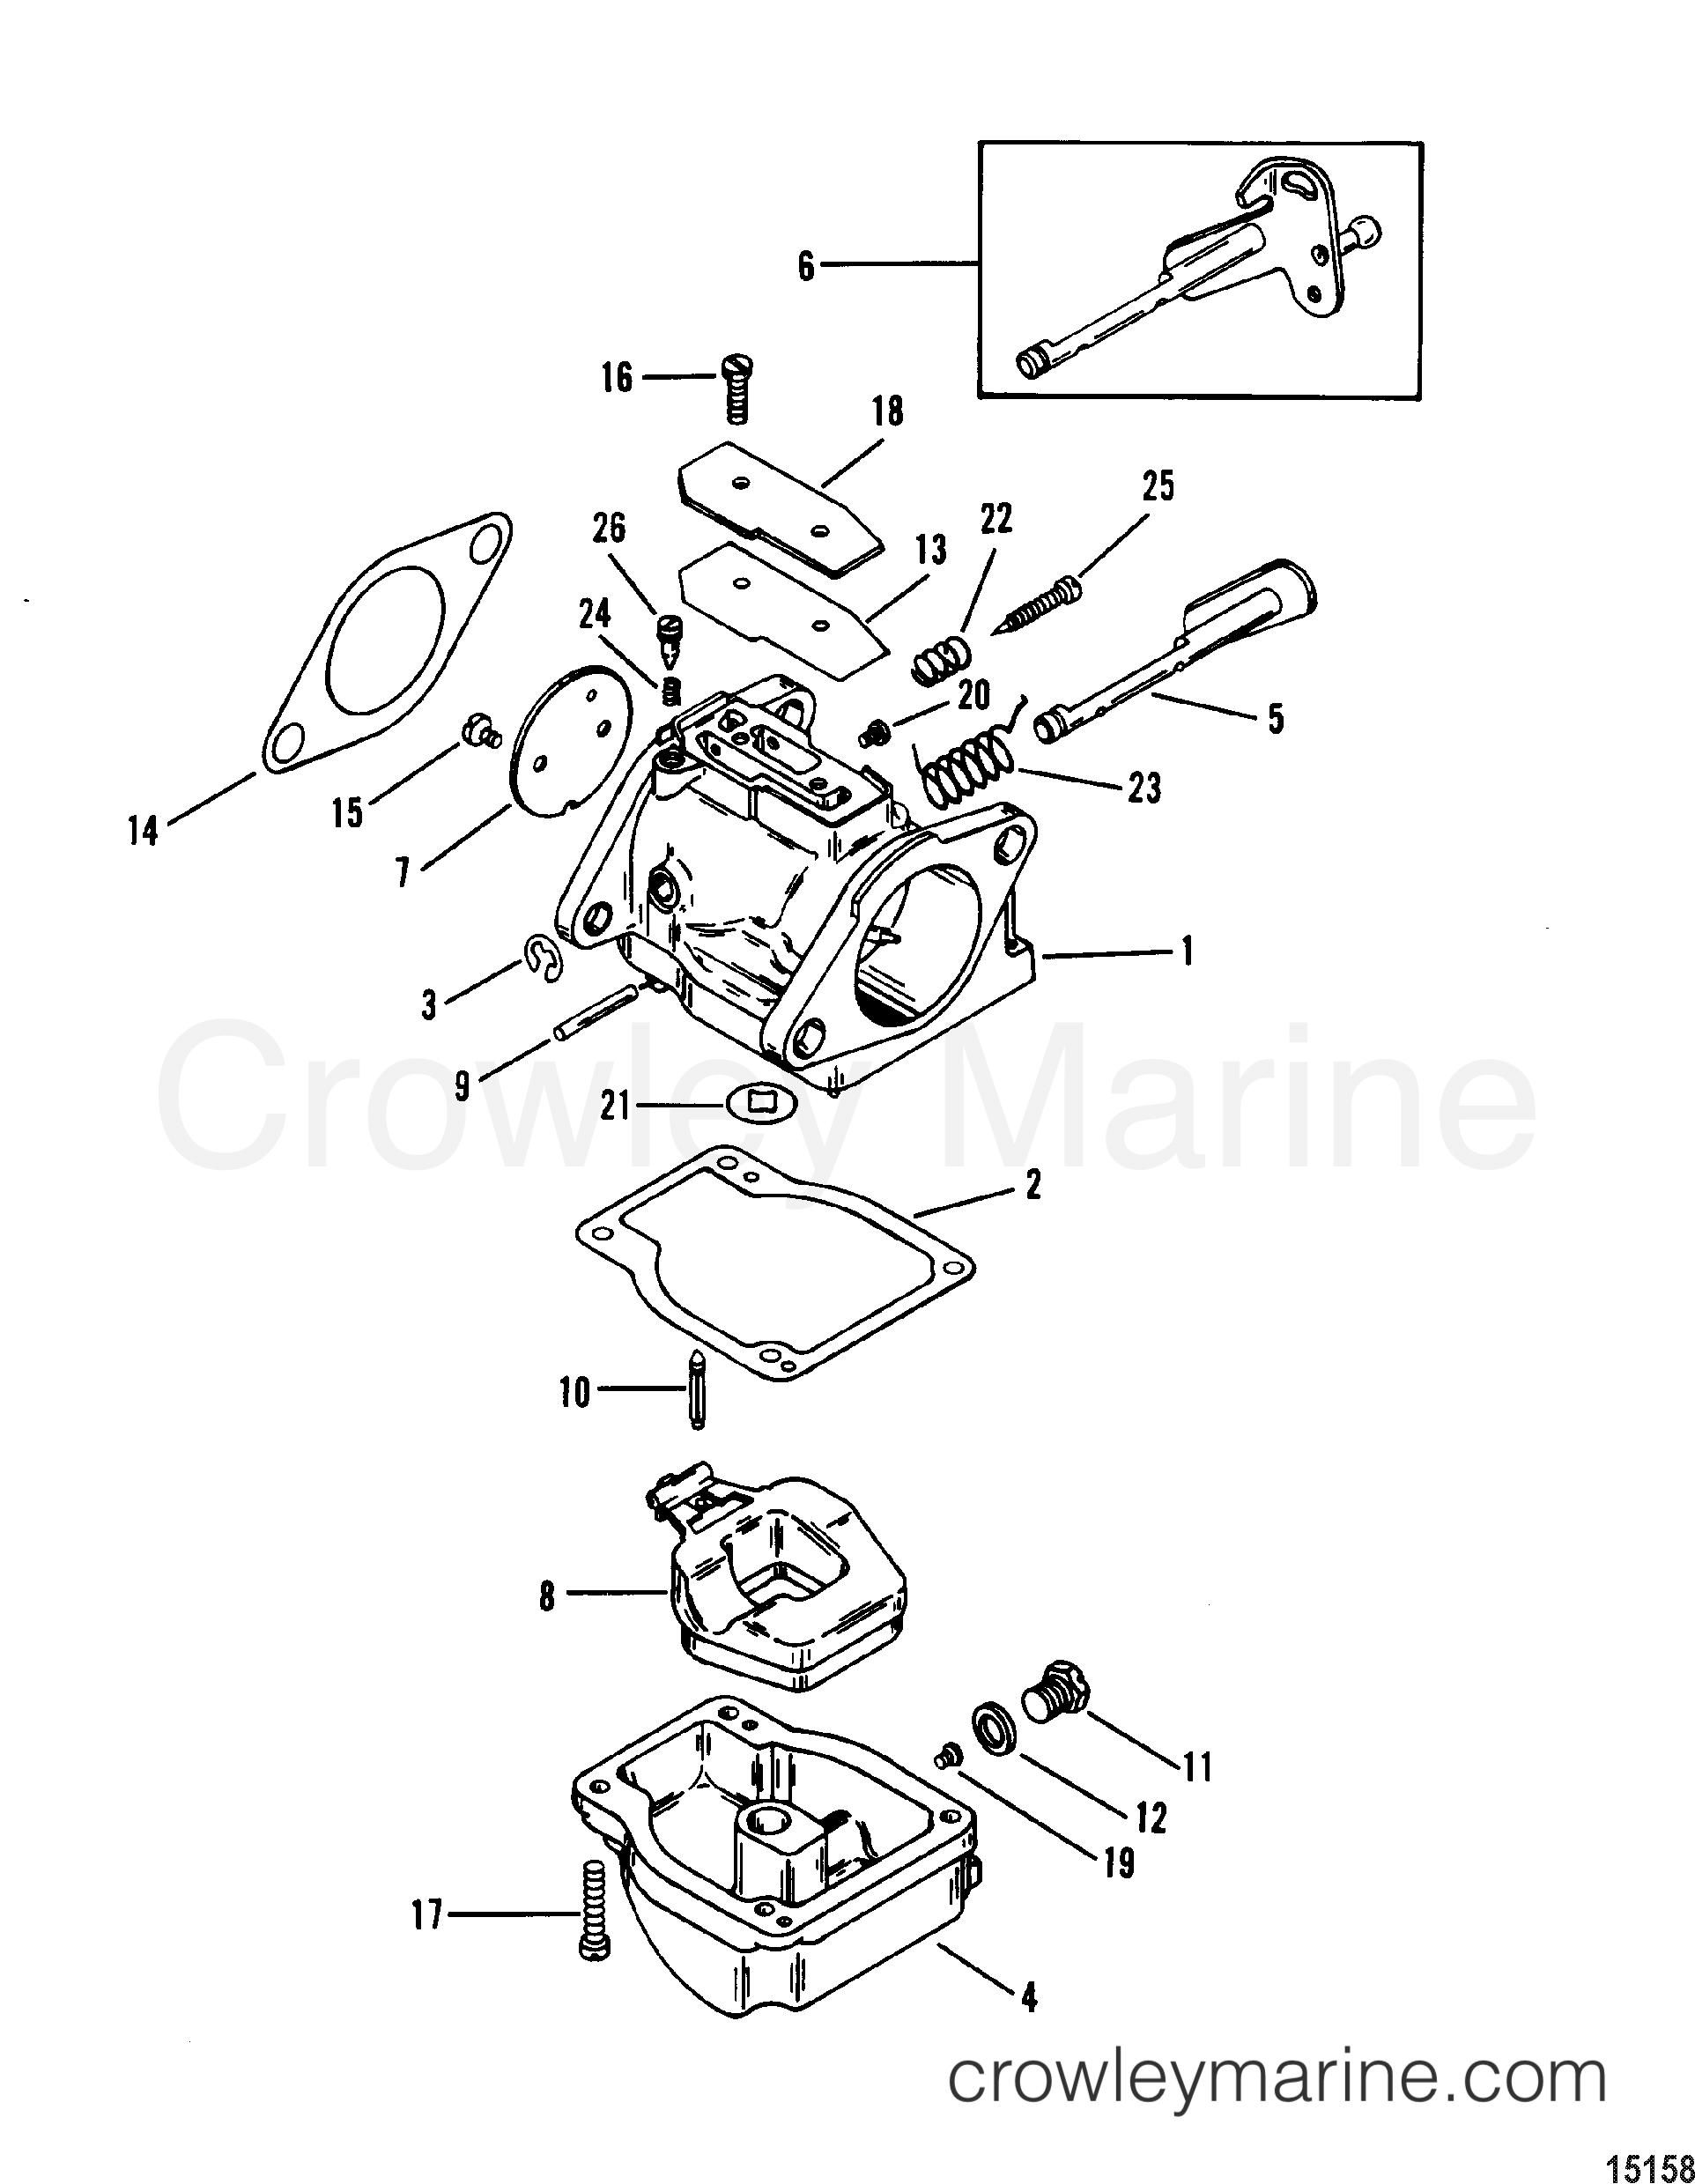 Serial Range Mercury Outboard 90 (3 CYL.) - 0B240451 THRU 0C221999 [USA] - CARBURETOR section